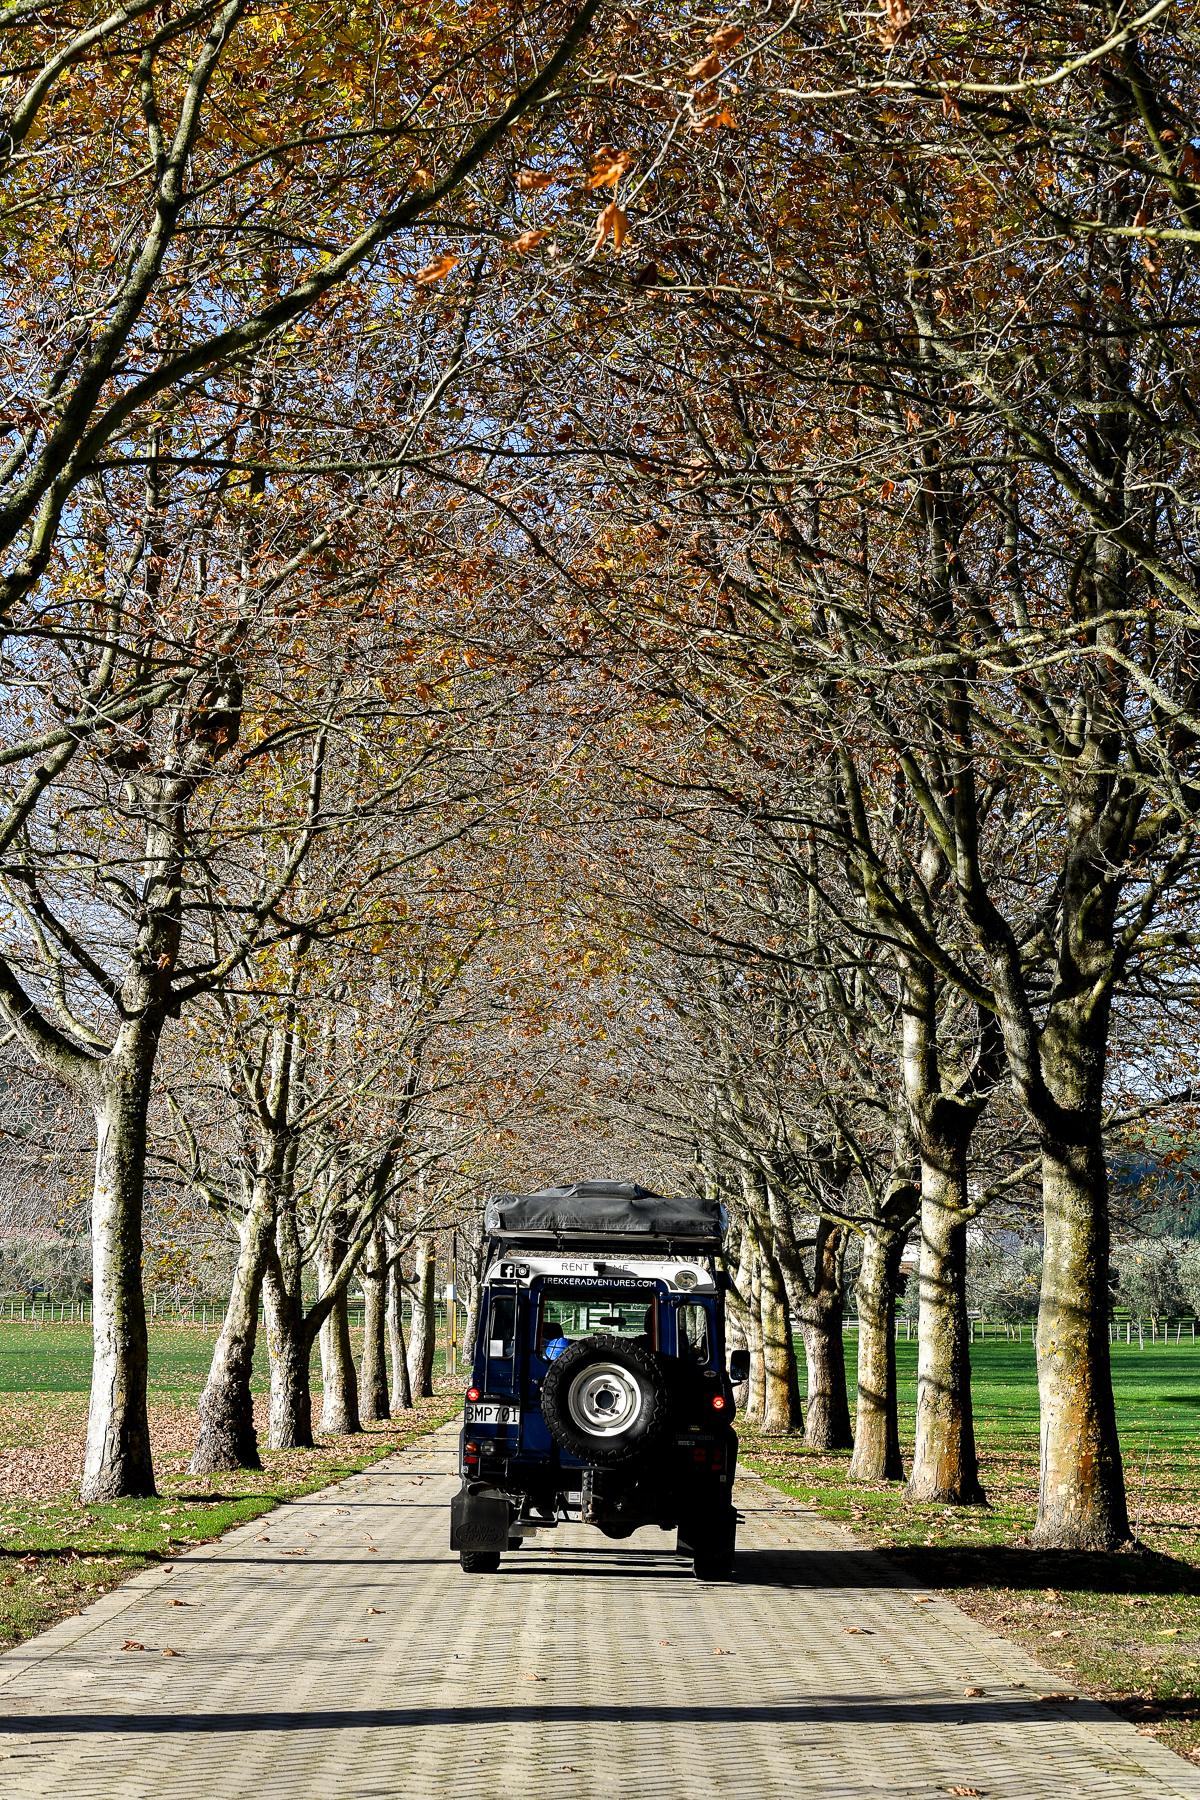 Stacie Flinner Land Rover Camping New Zealand-75.jpg